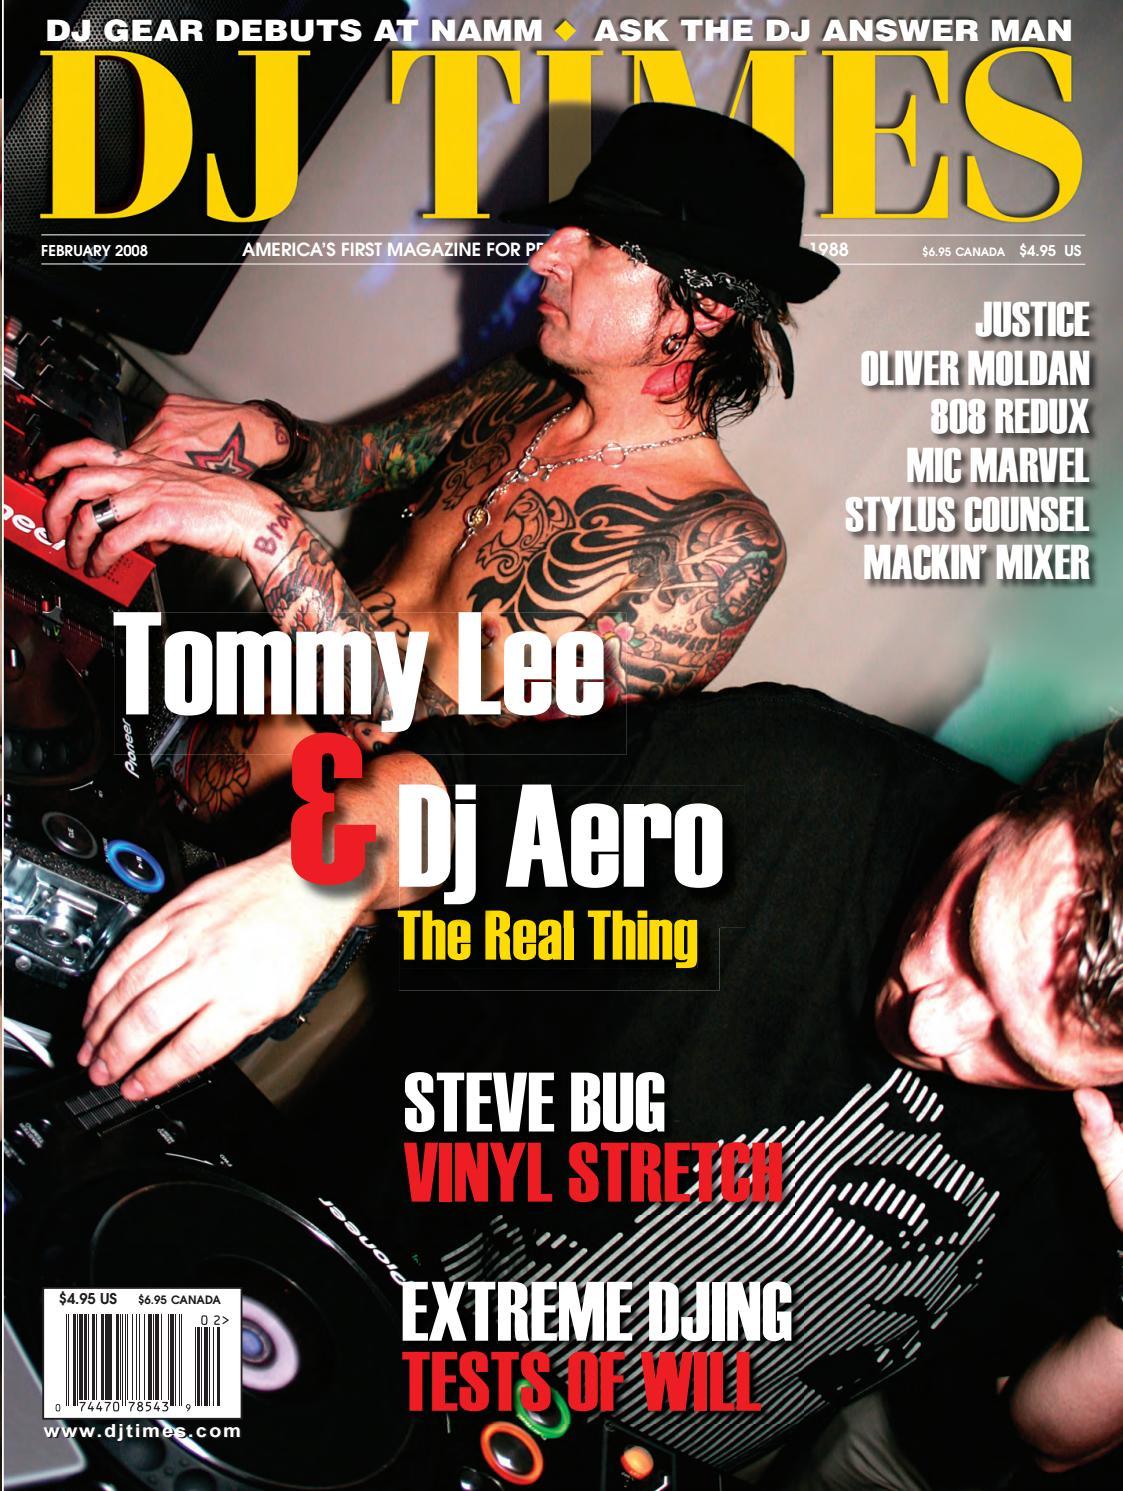 DJ Times February 2008, Vol 21 No 2 by DJ Times Magazine - issuu